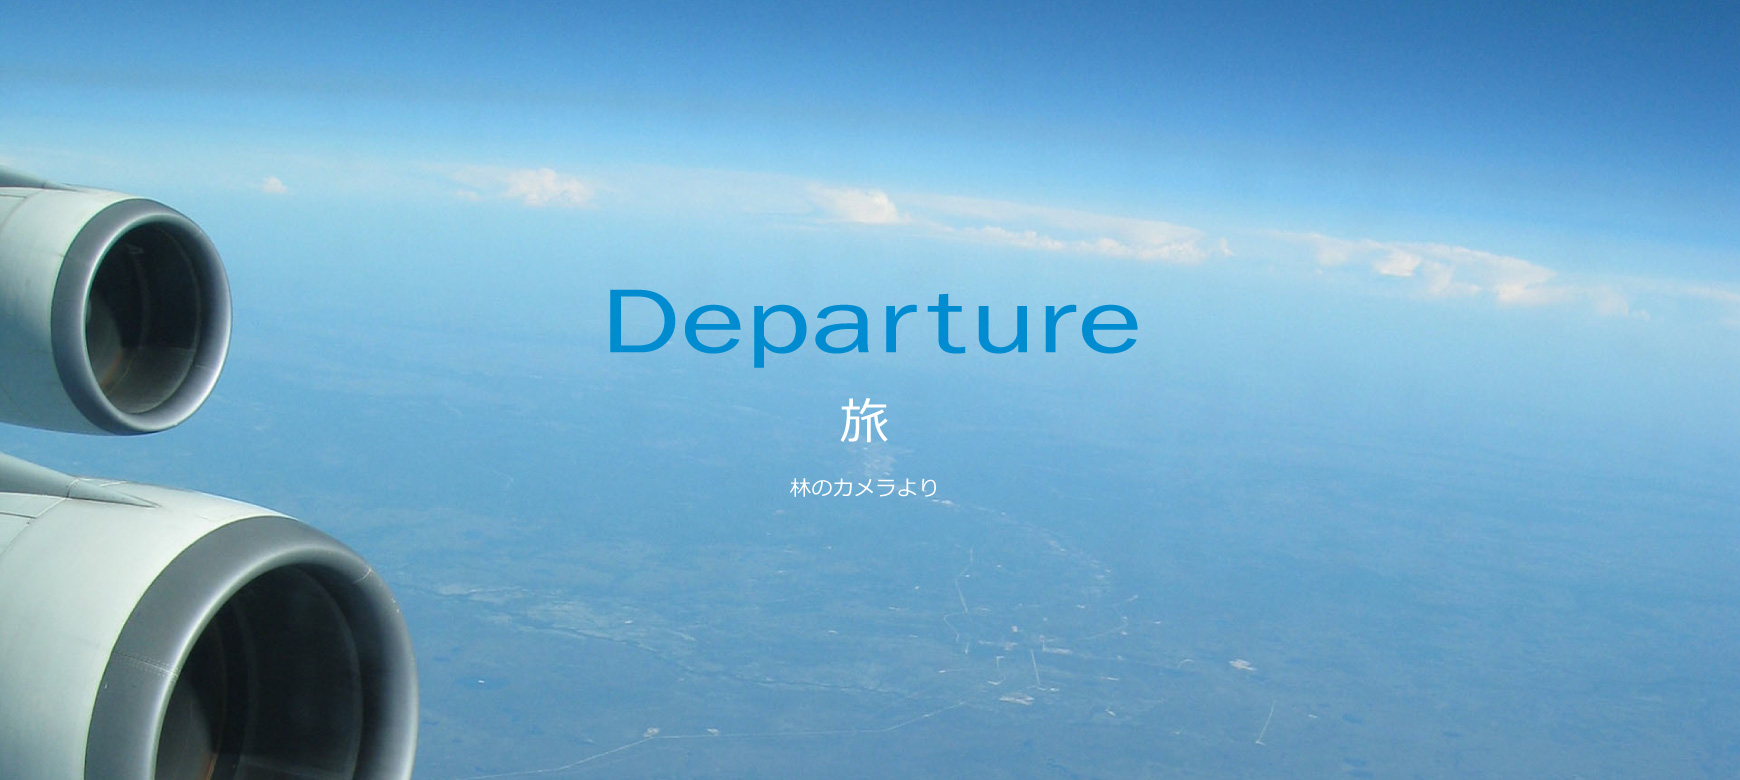 Departure 旅